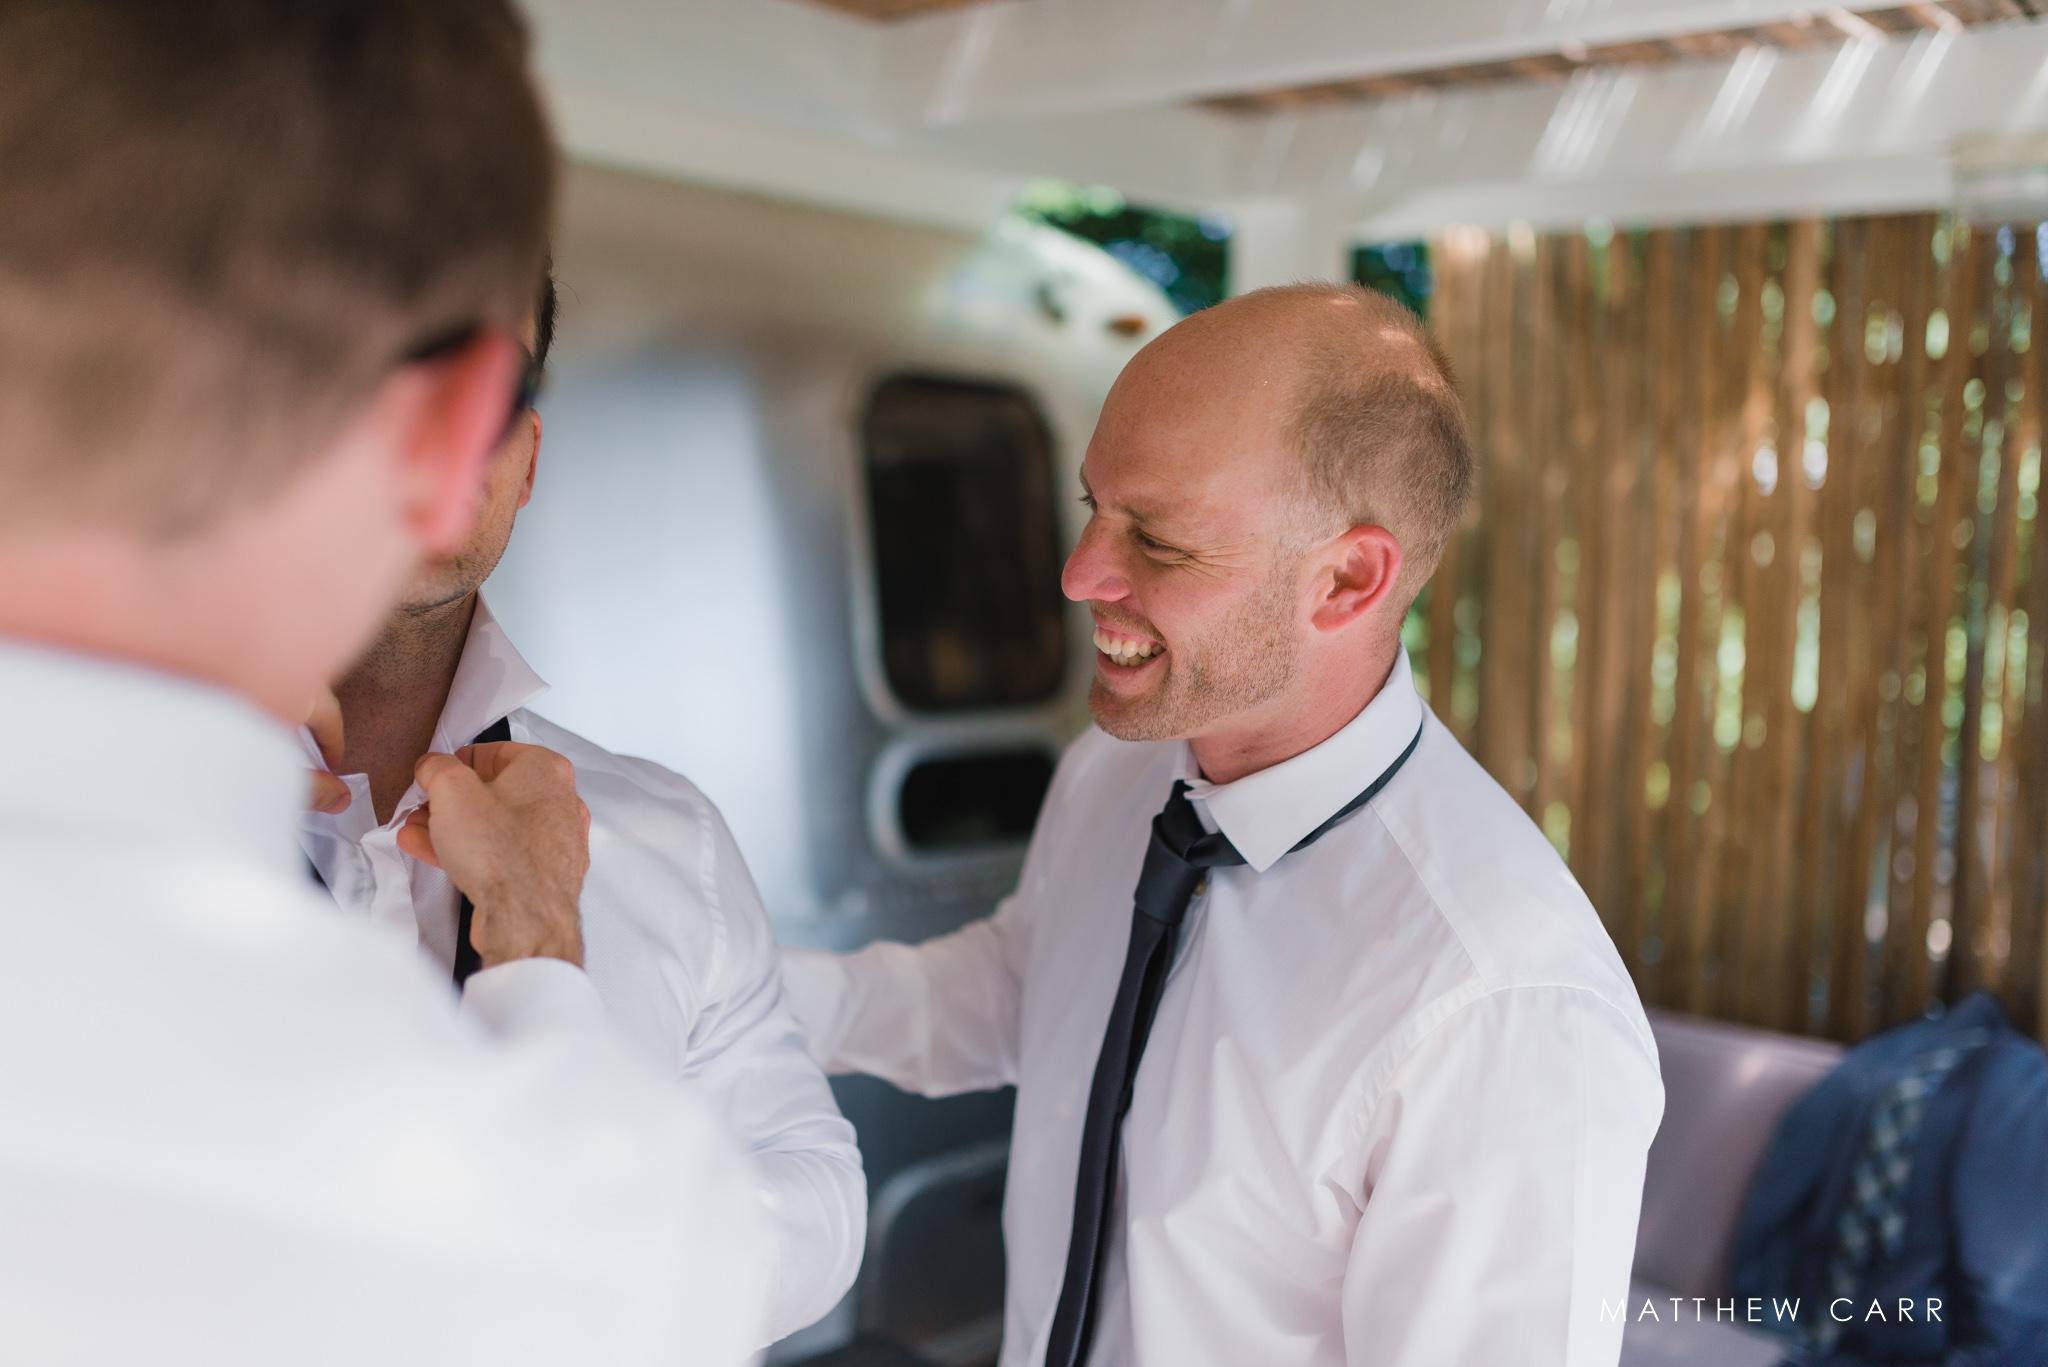 wedding prep - low res (viewing, social media) (123 of 276).JPG